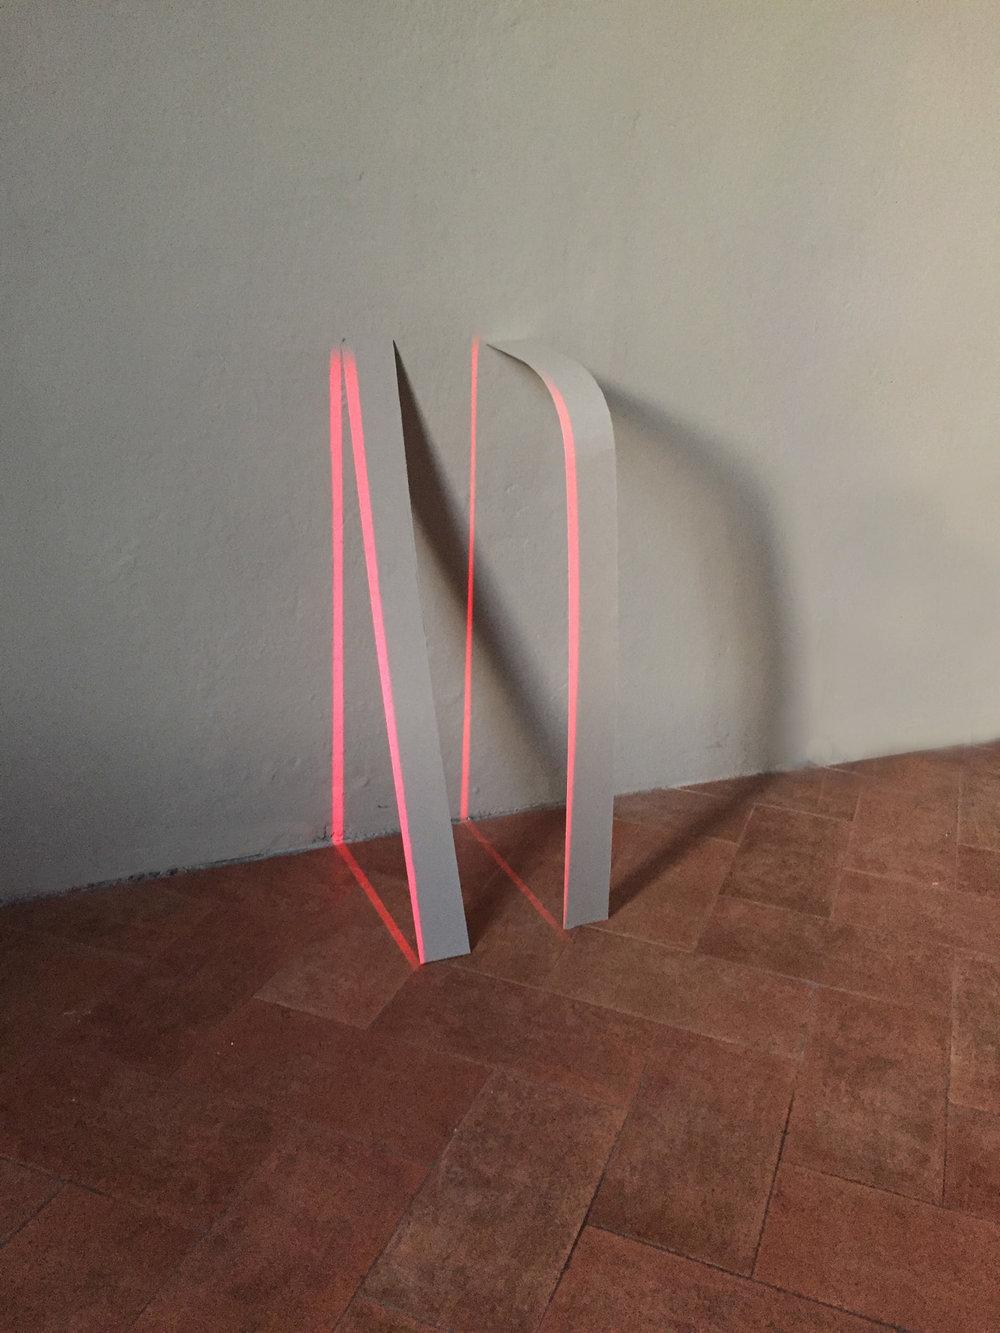 Q+A with Light Artist Dori Deng on Anniversary Magazine